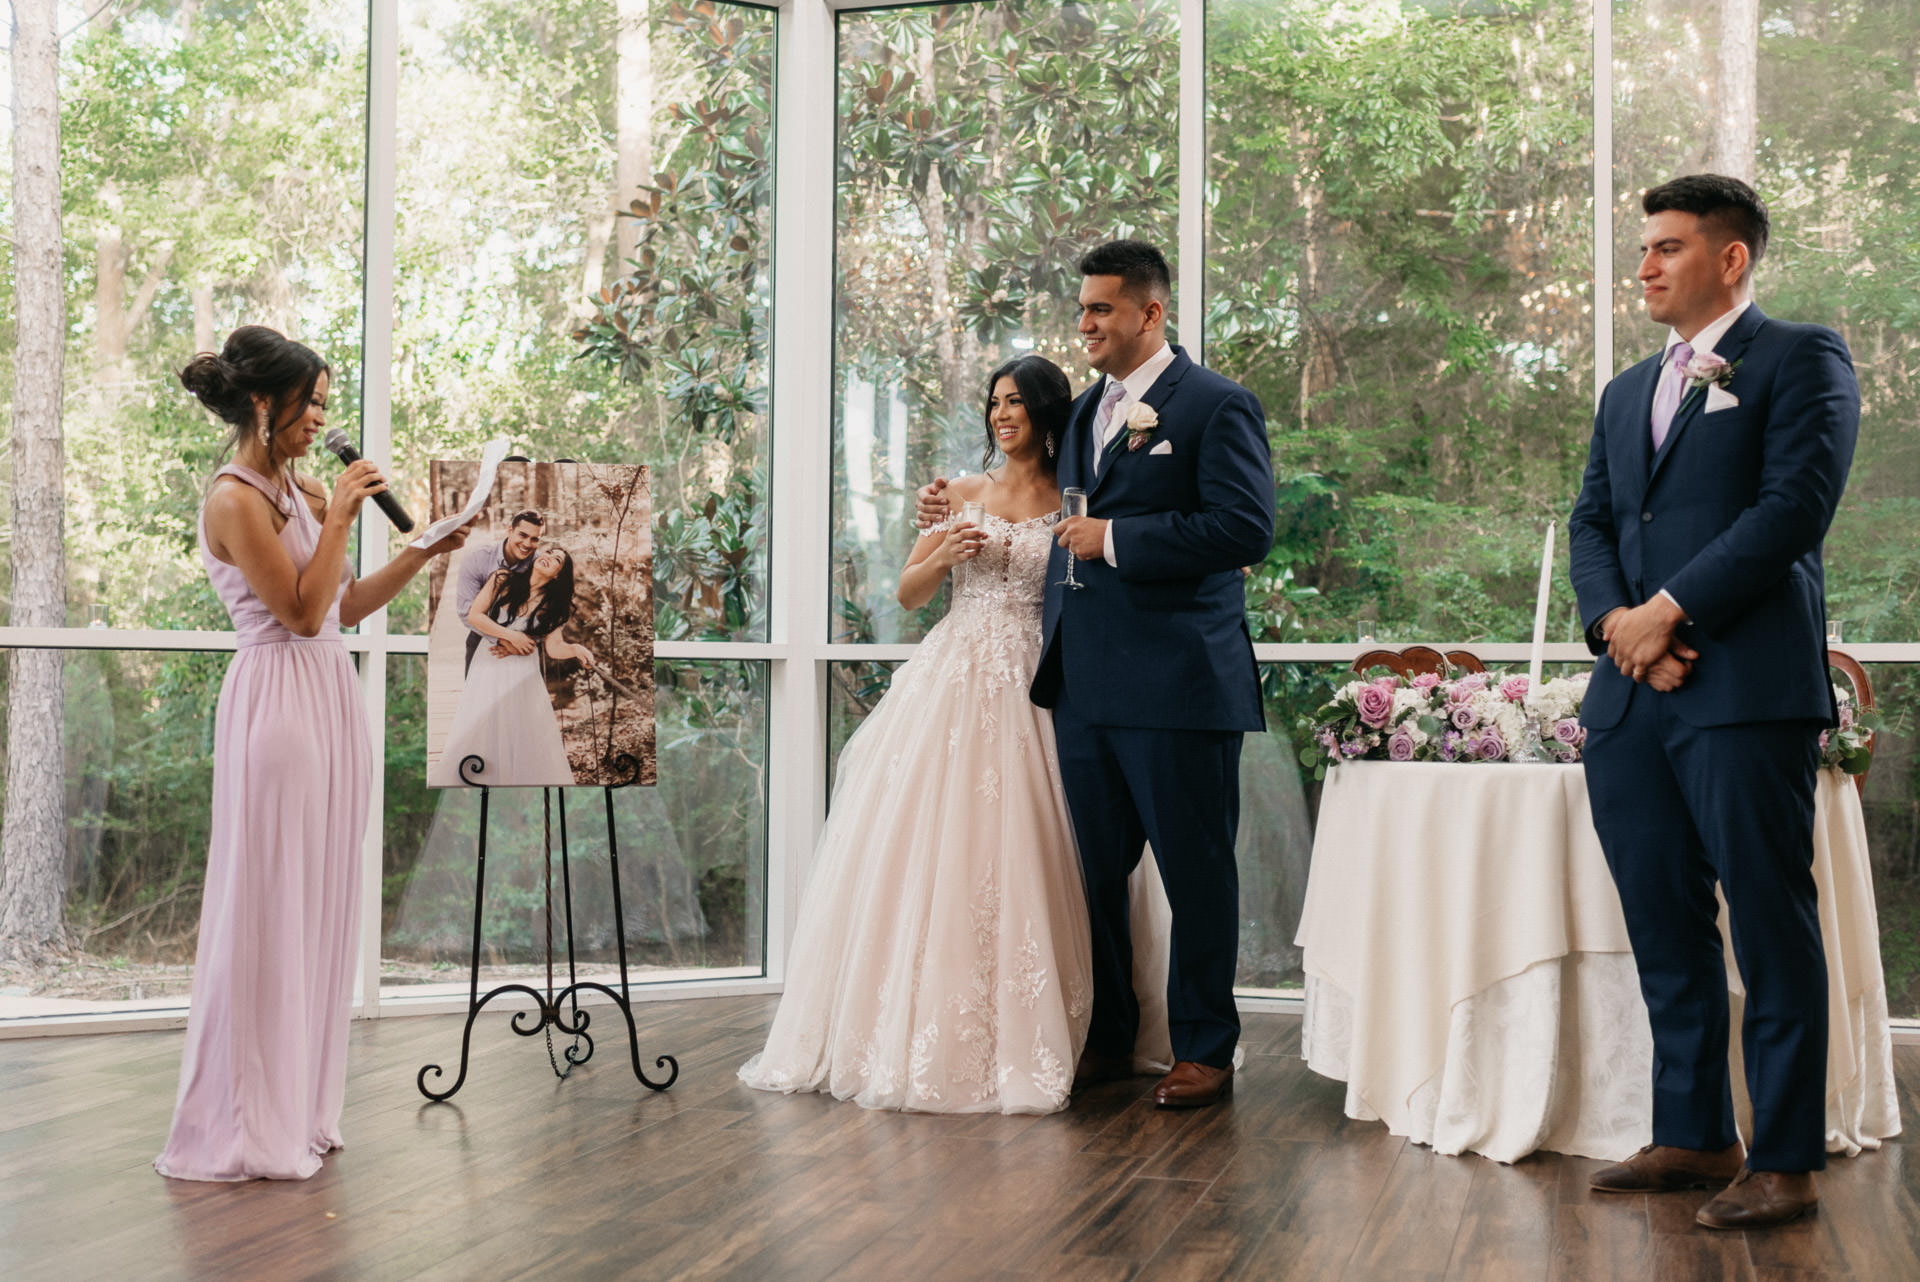 lexi-michael-wedding-blog-sm-92.jpg